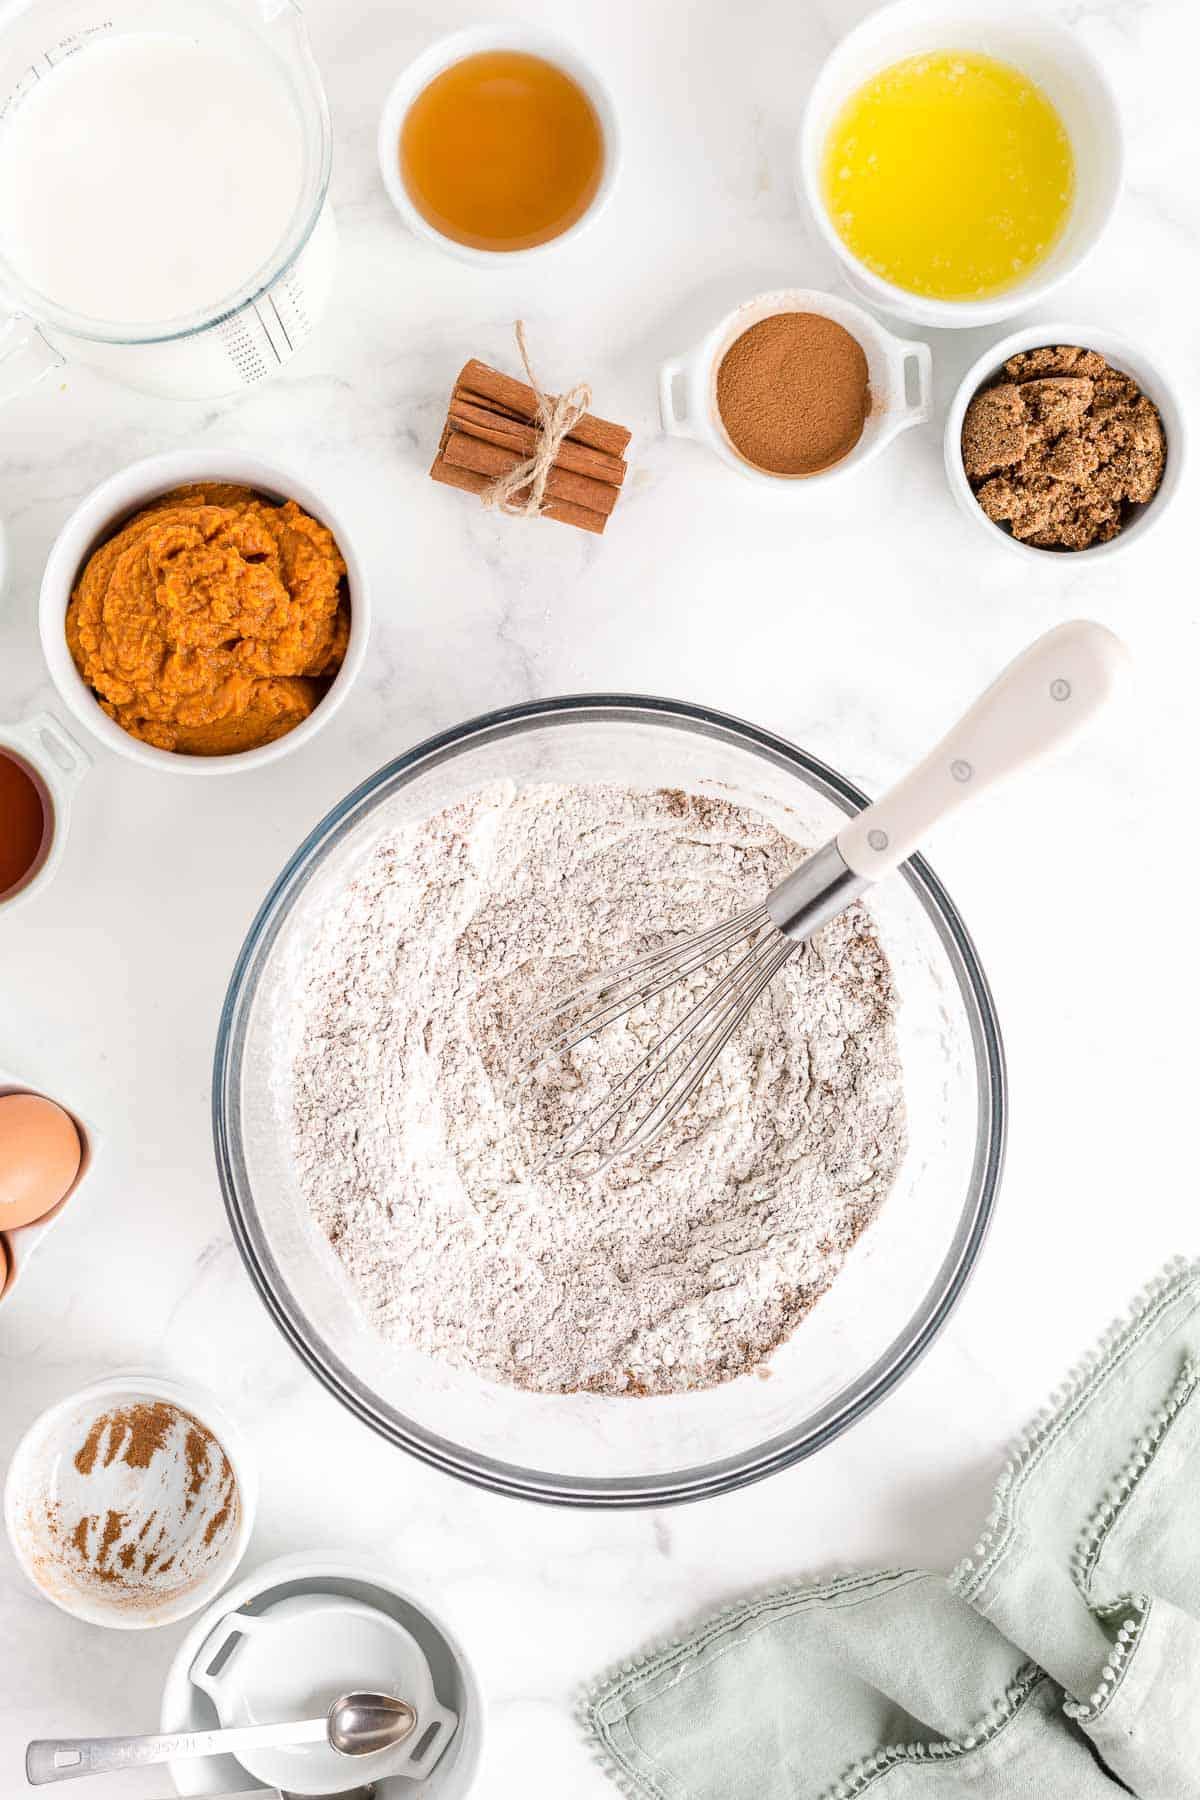 Dry ingredients for pumpkin pancakes in a bowl, wet ingredients surrounding it.